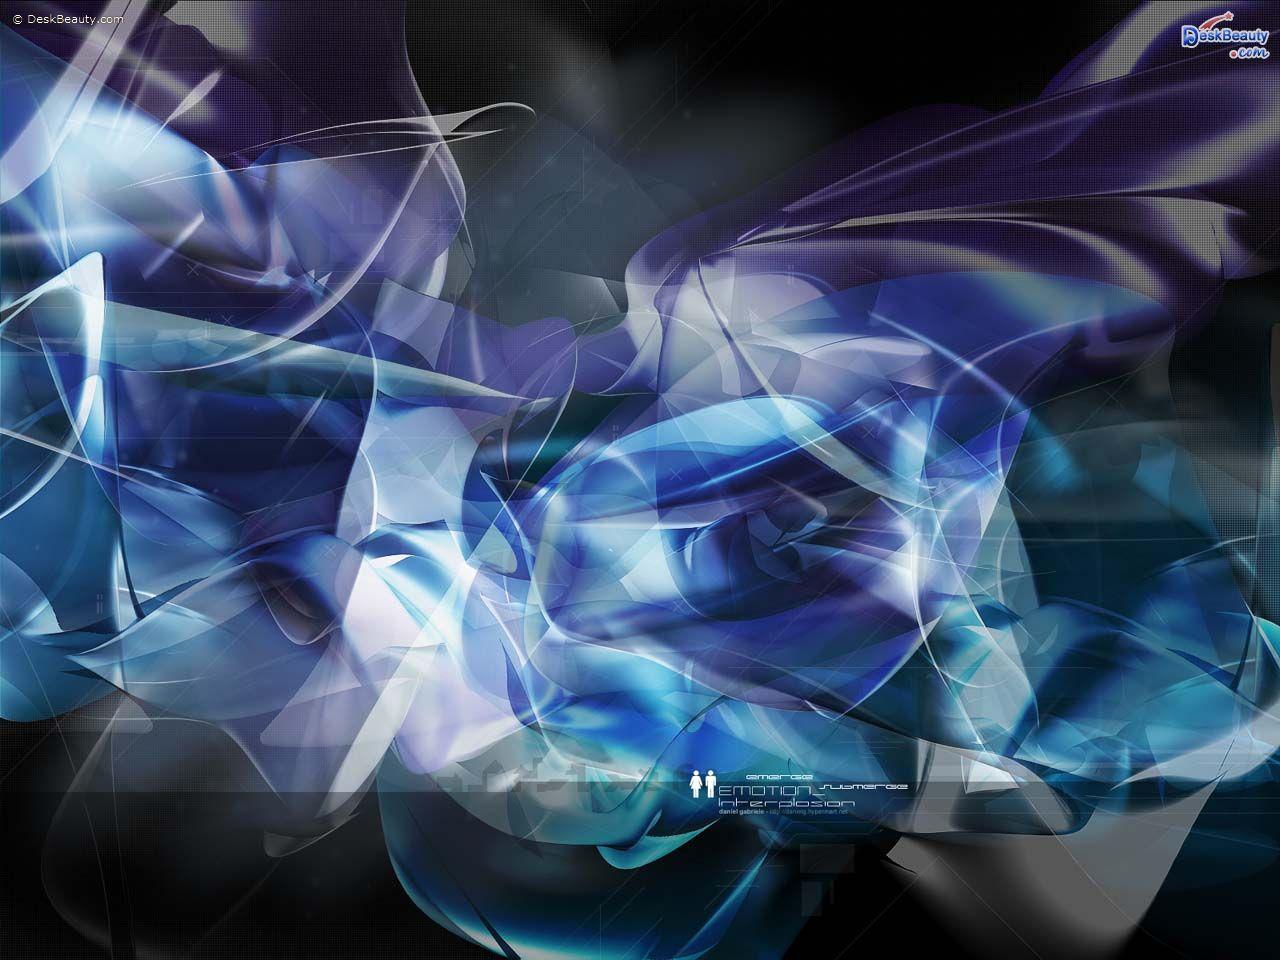 http://1.bp.blogspot.com/-11qXpzQl_mM/UDoRUks6xCI/AAAAAAAAASo/-GedAHZtdSQ/s1600/3D+Teal+Wallpaper.jpg